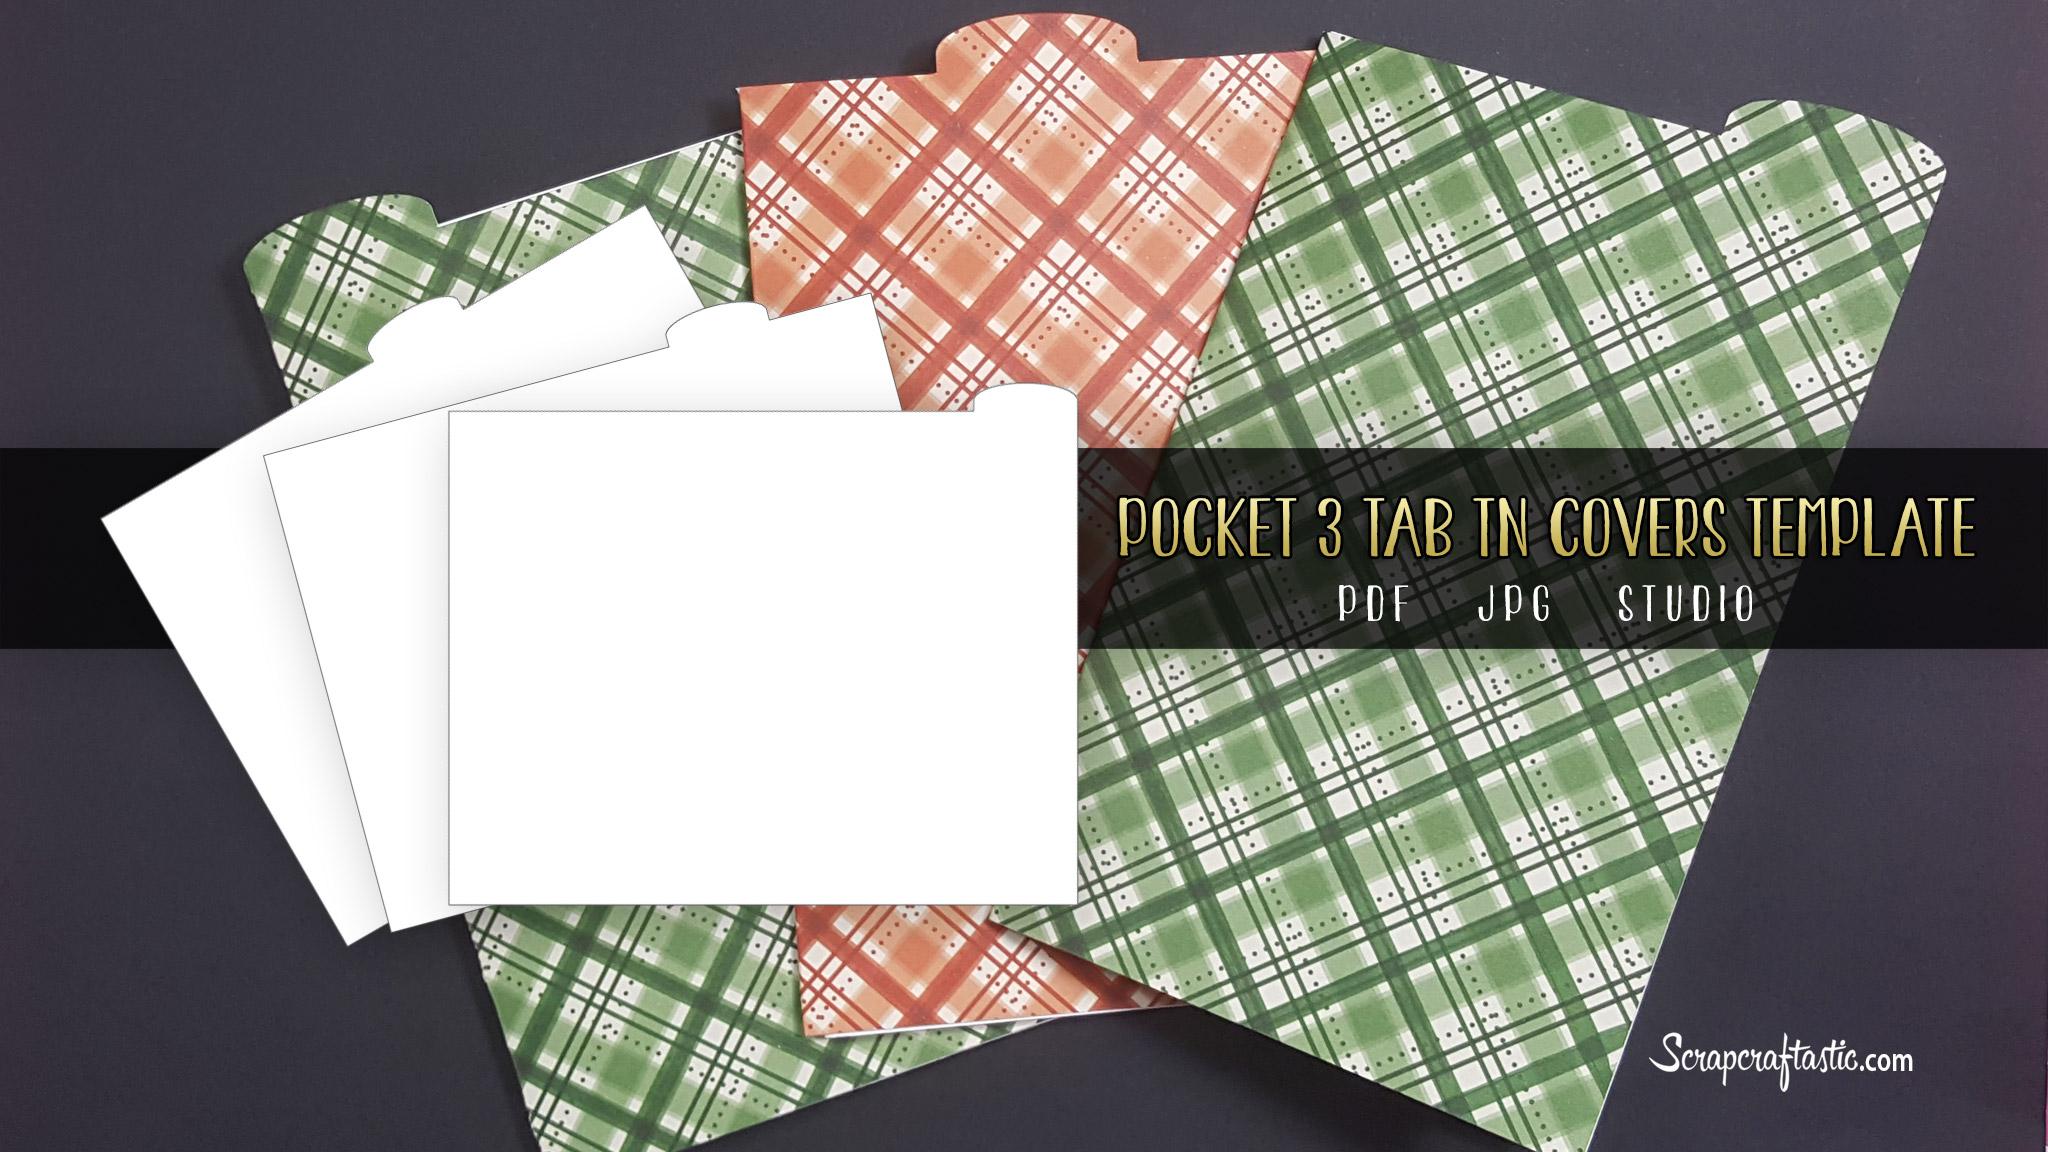 Pocket 3 Tab TN Covers Template